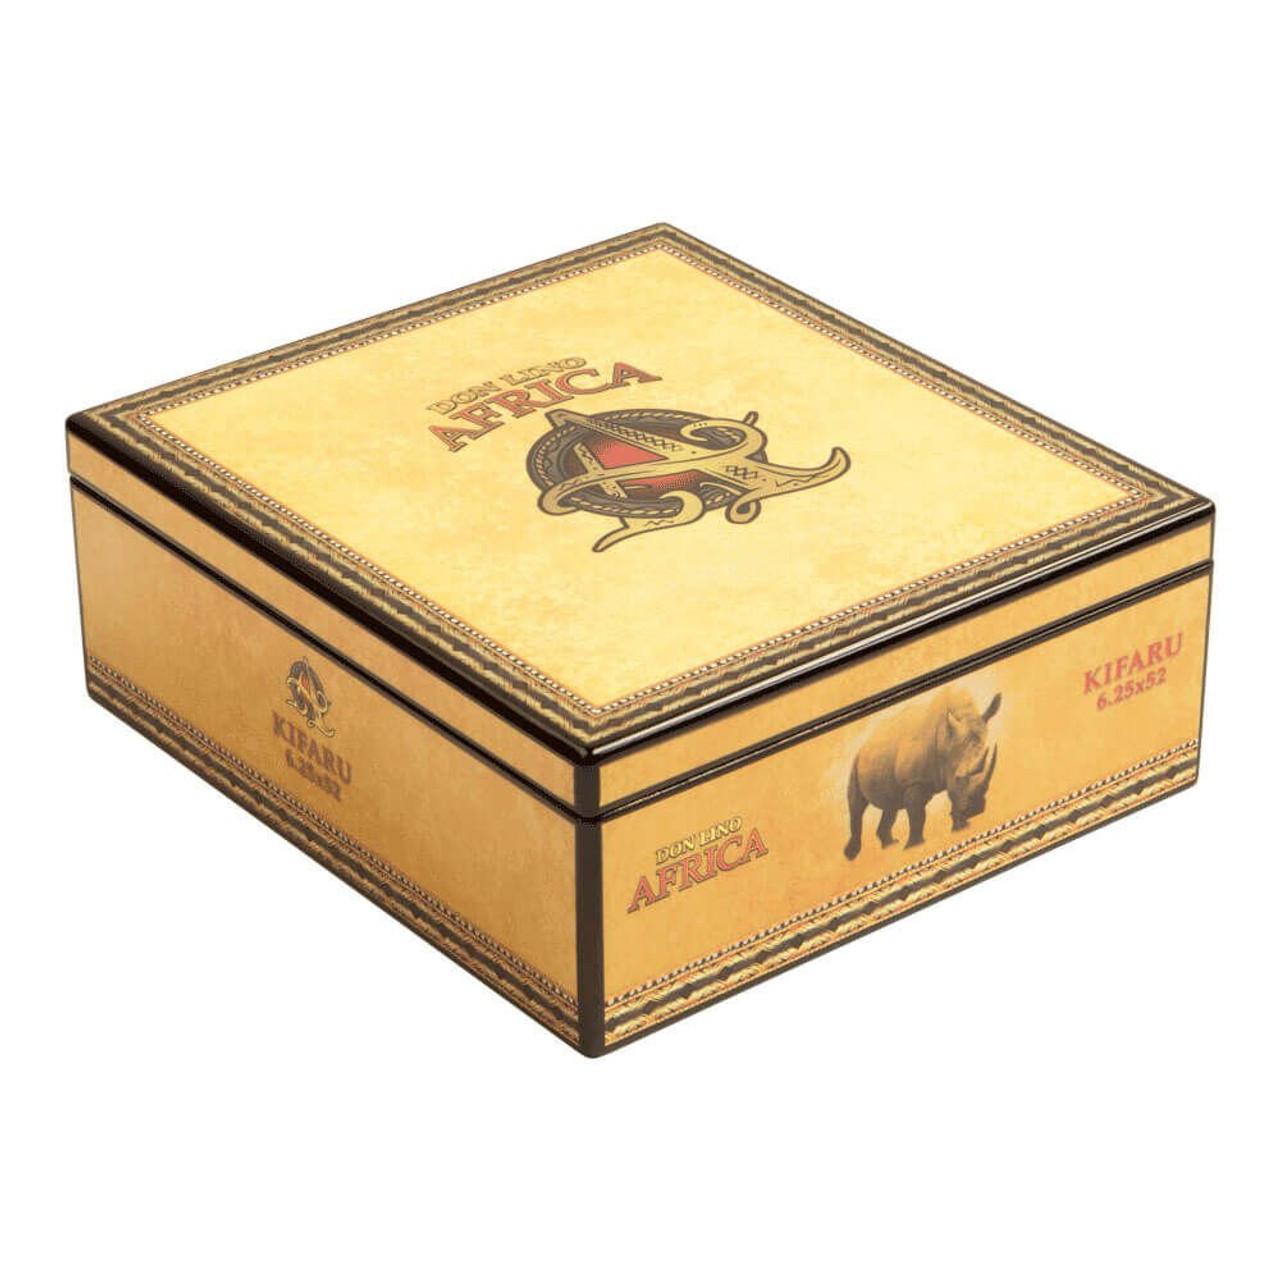 Don Lino Africa Robusto Duma Cigars - 5.0 x 50 (Box of 20)